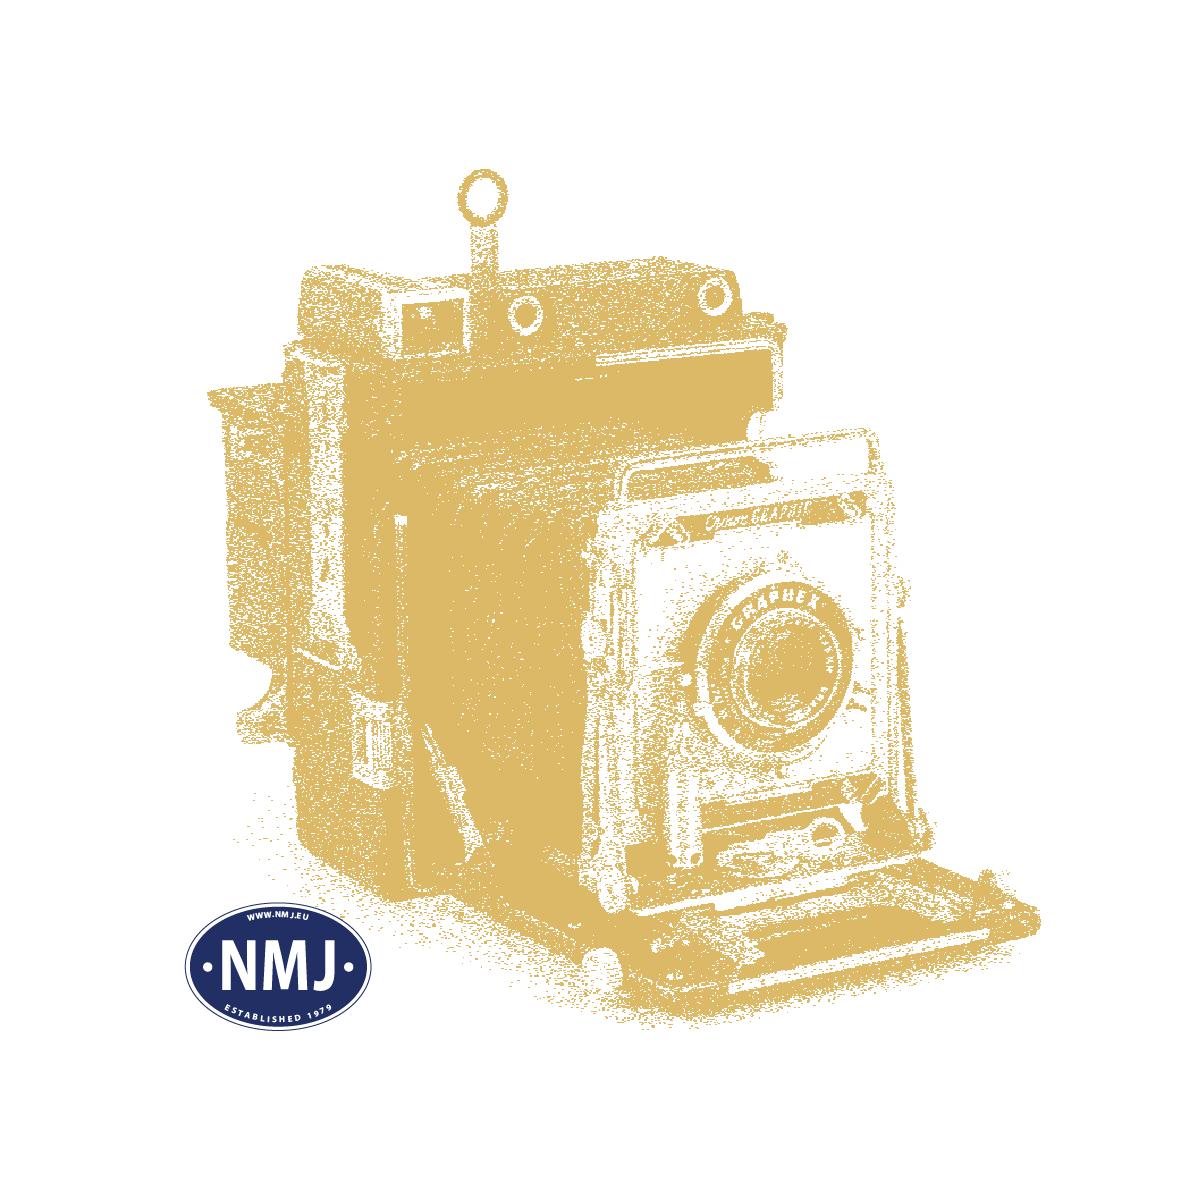 NMJT80.101AC - NMJ Topline NSB EL17.2221, AC, rotbraun